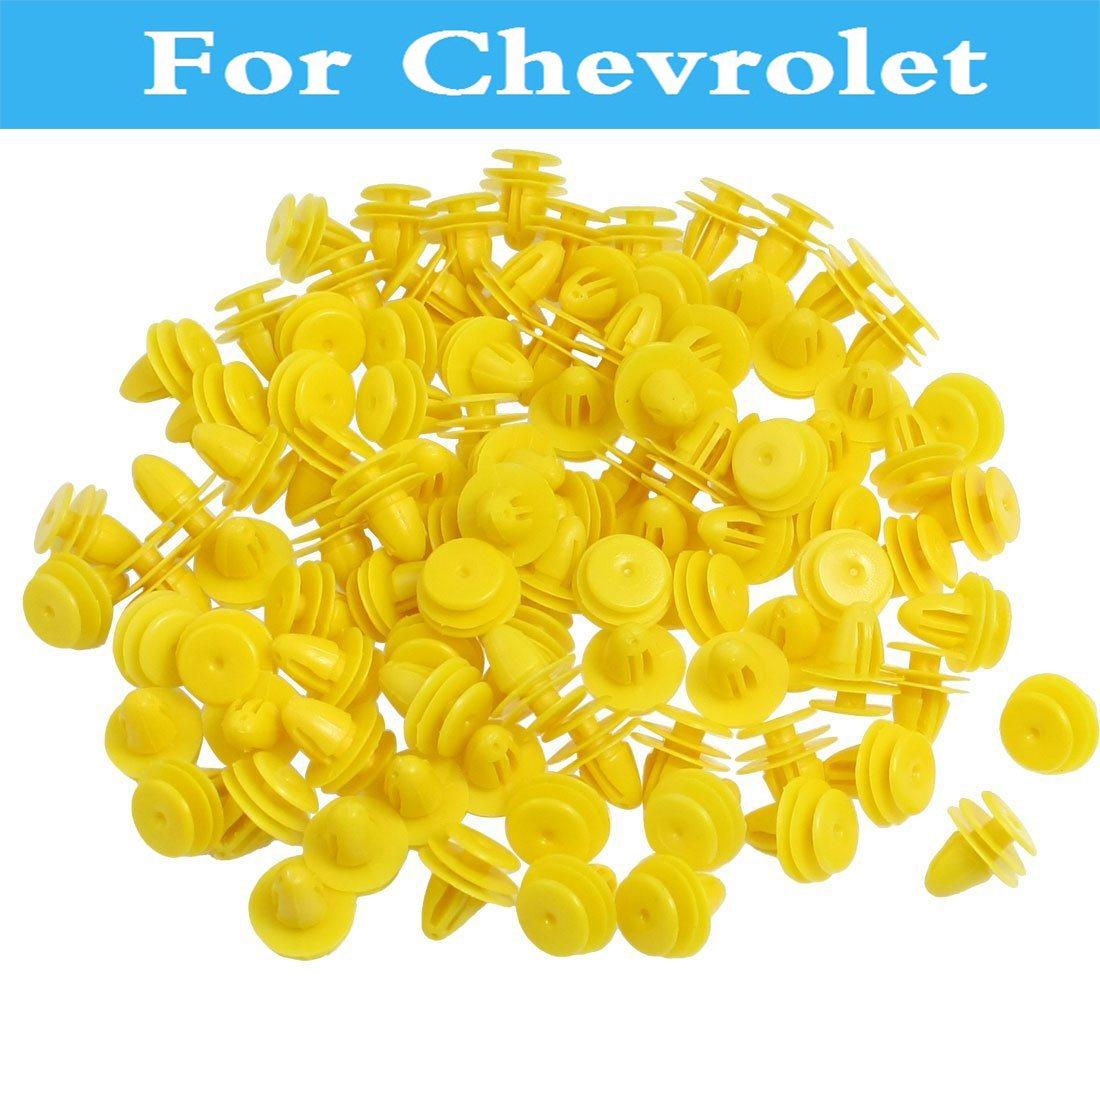 50 Uds remaches de parachoques del coche guardabarros clips de panel de corte amarillo para Chevrolet Spark Lanos Malibú Niva navegar Sonic Metro Monte Carlo Mw